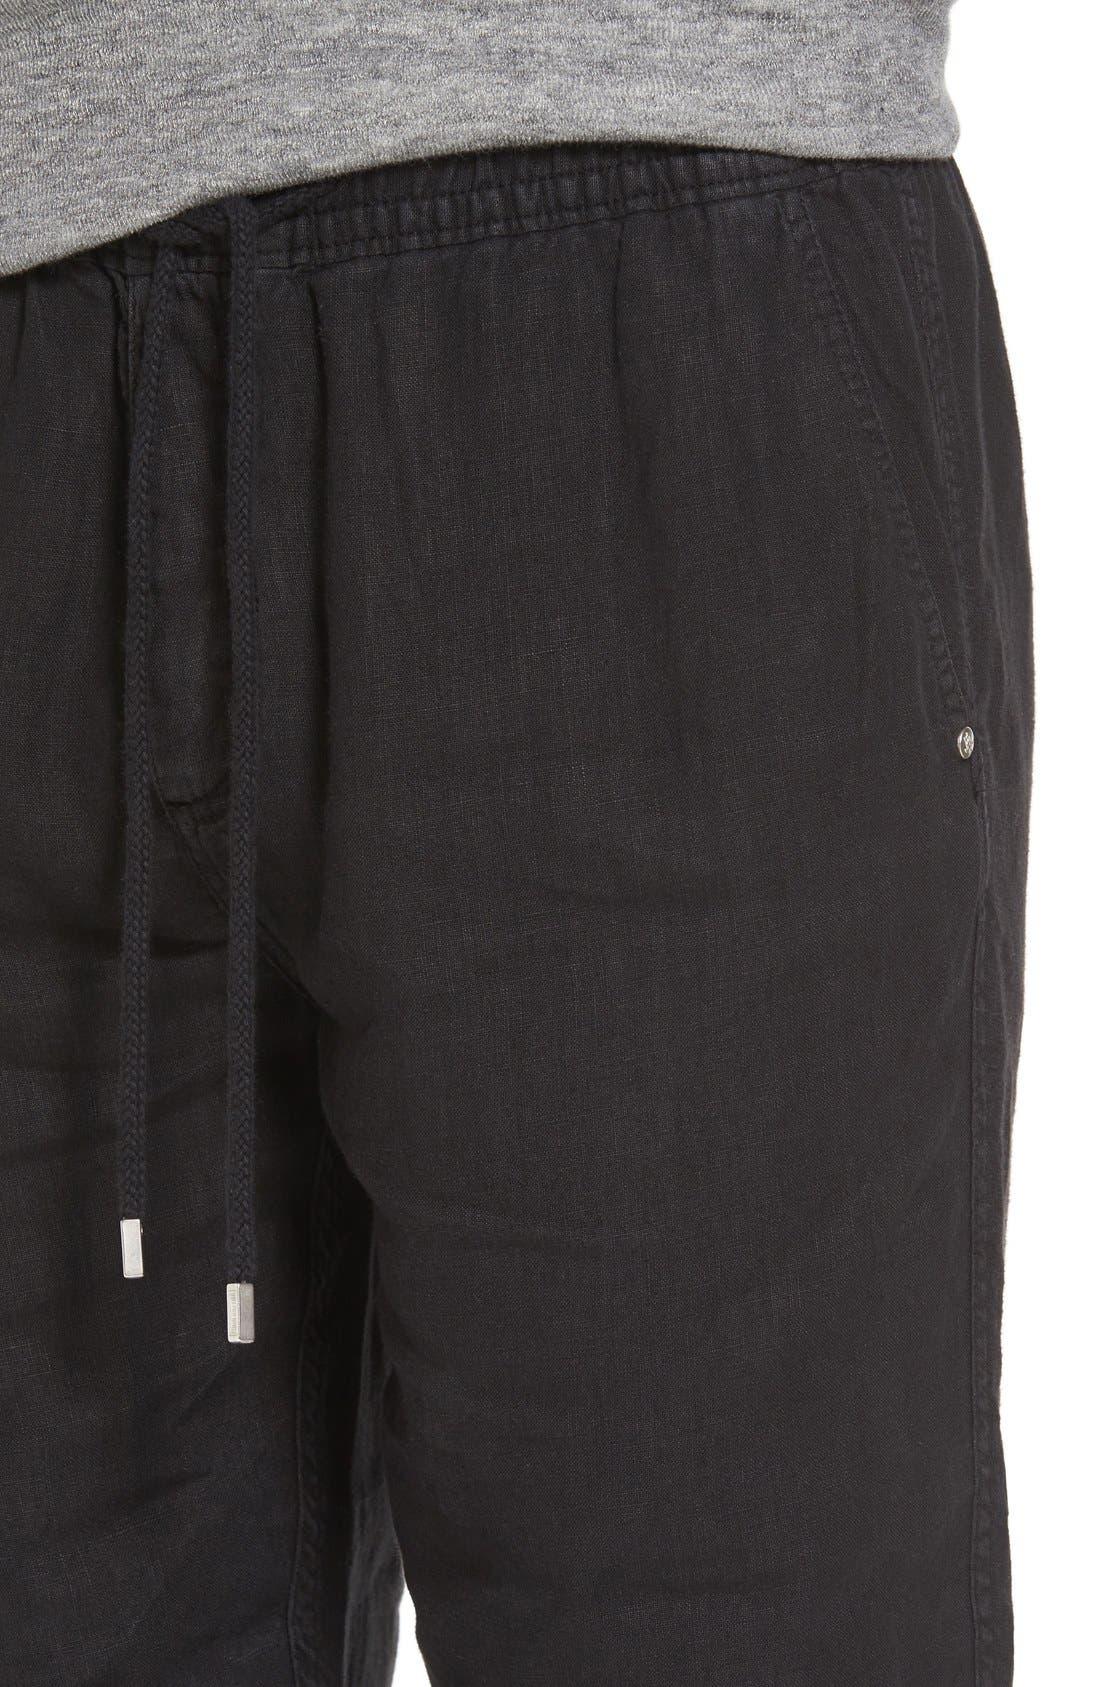 'Classic' Linen Pants,                             Alternate thumbnail 4, color,                             Black